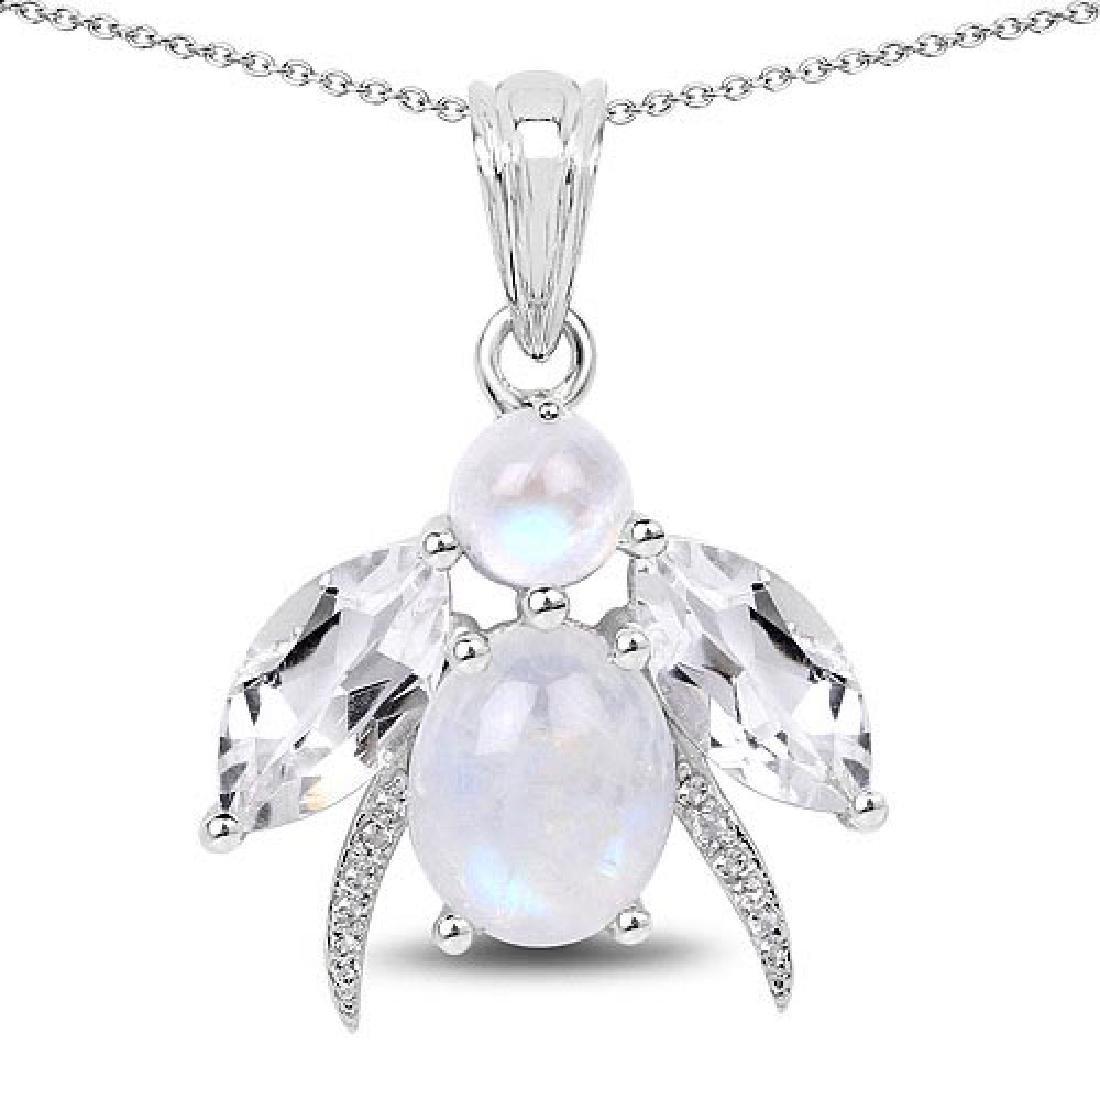 7.43 Carat Genuine White Rainbow Moonstone Crystal Qua